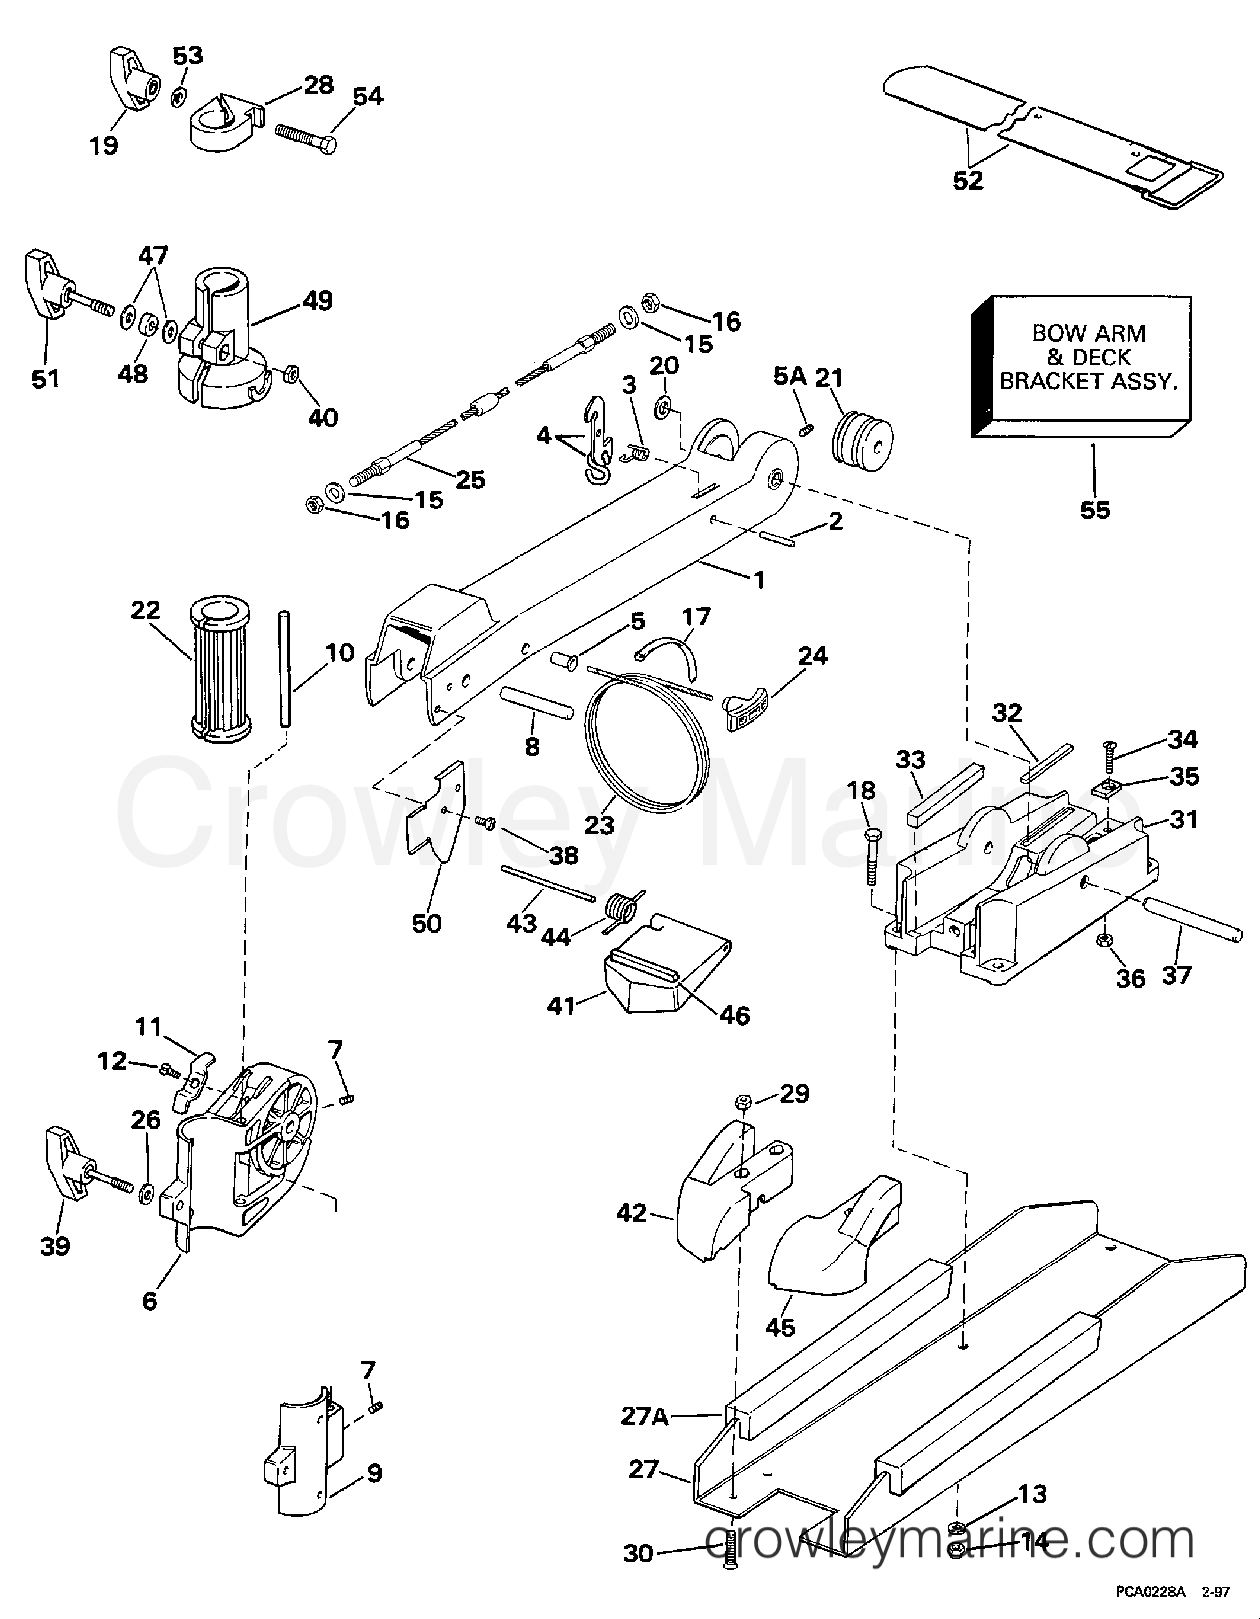 1997 Electric Motors 24 Volt - BF4P - BOW ARM & DECK BRACKET GROUP